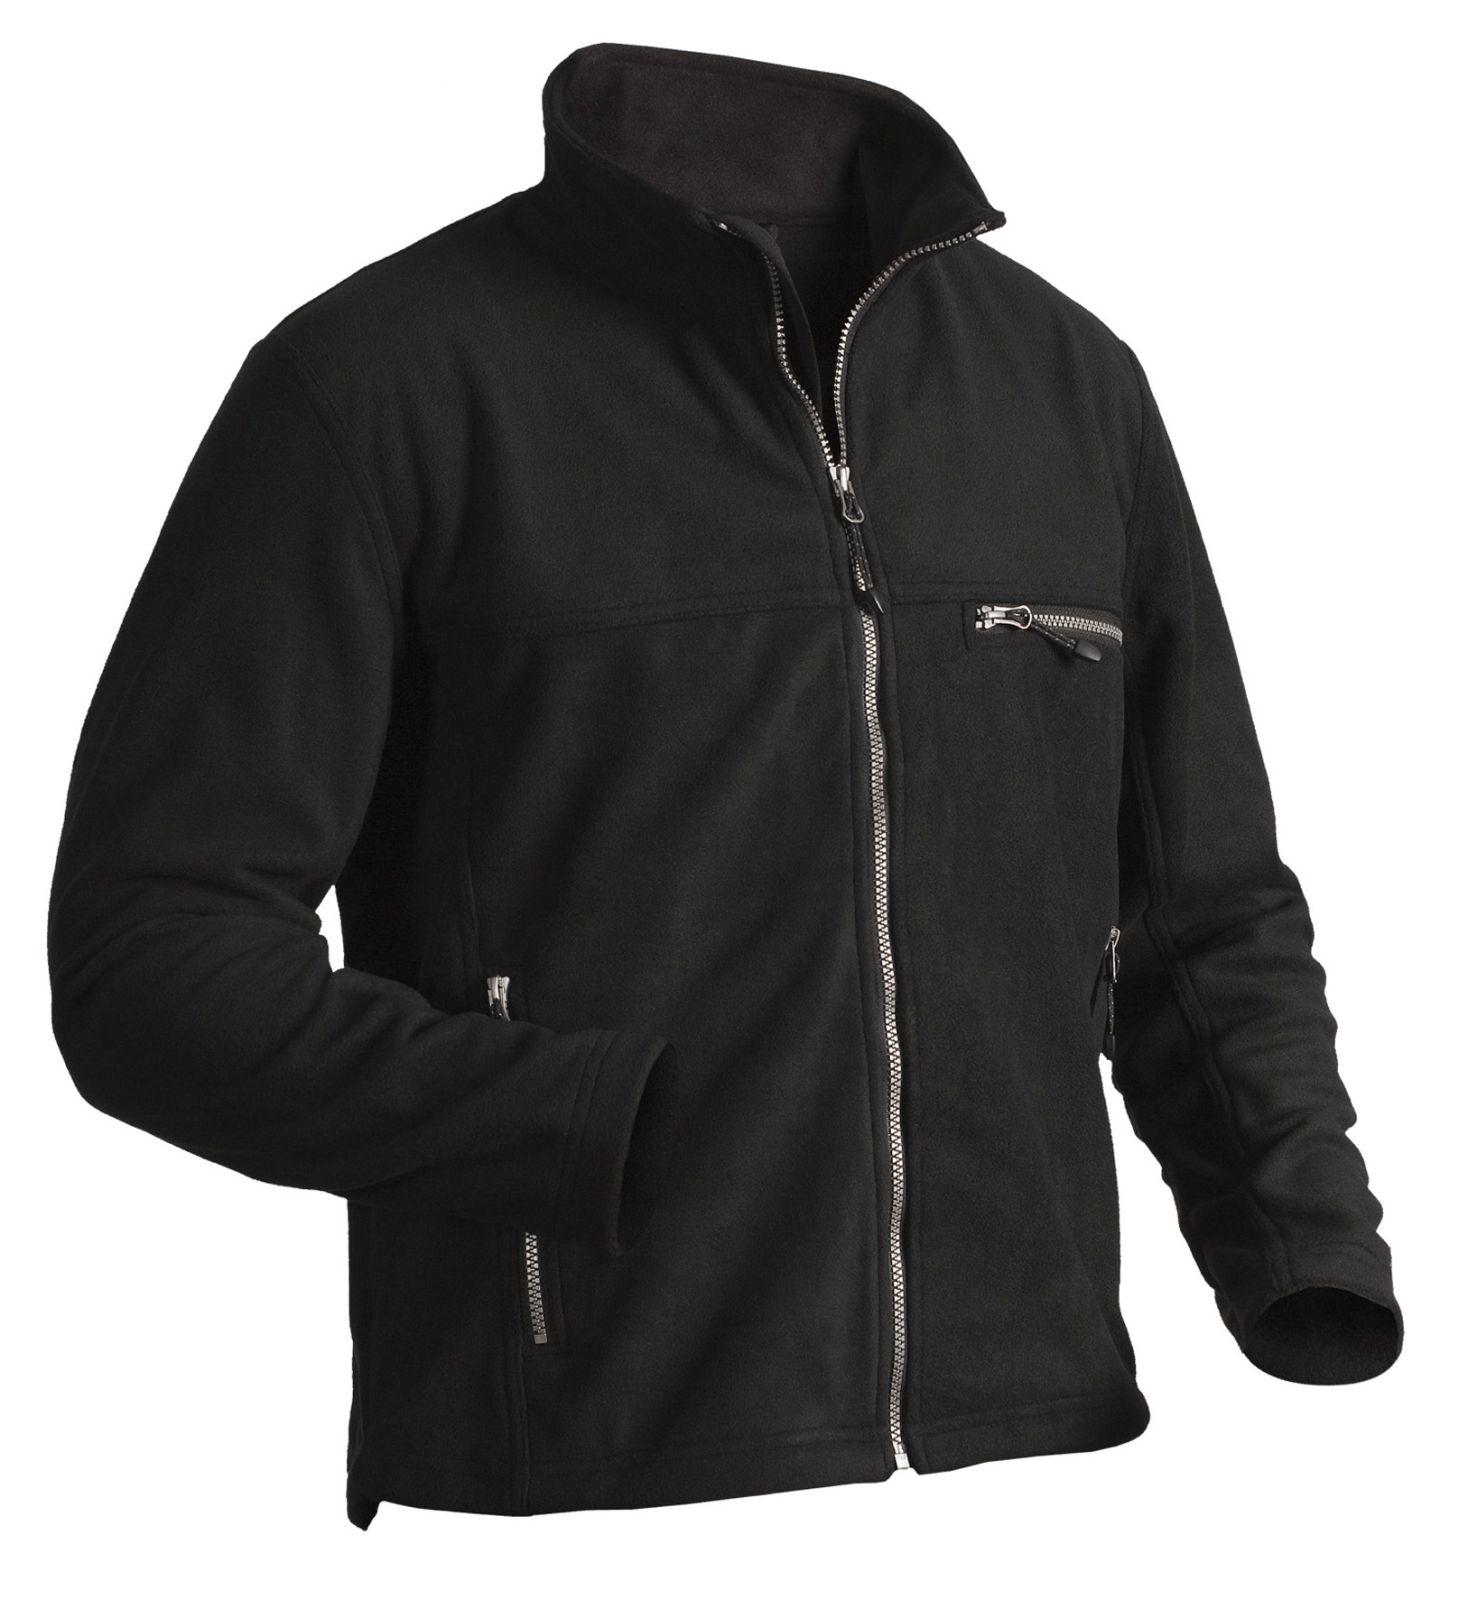 Blaklader Fleece jassen 48362525 zwart(9900)